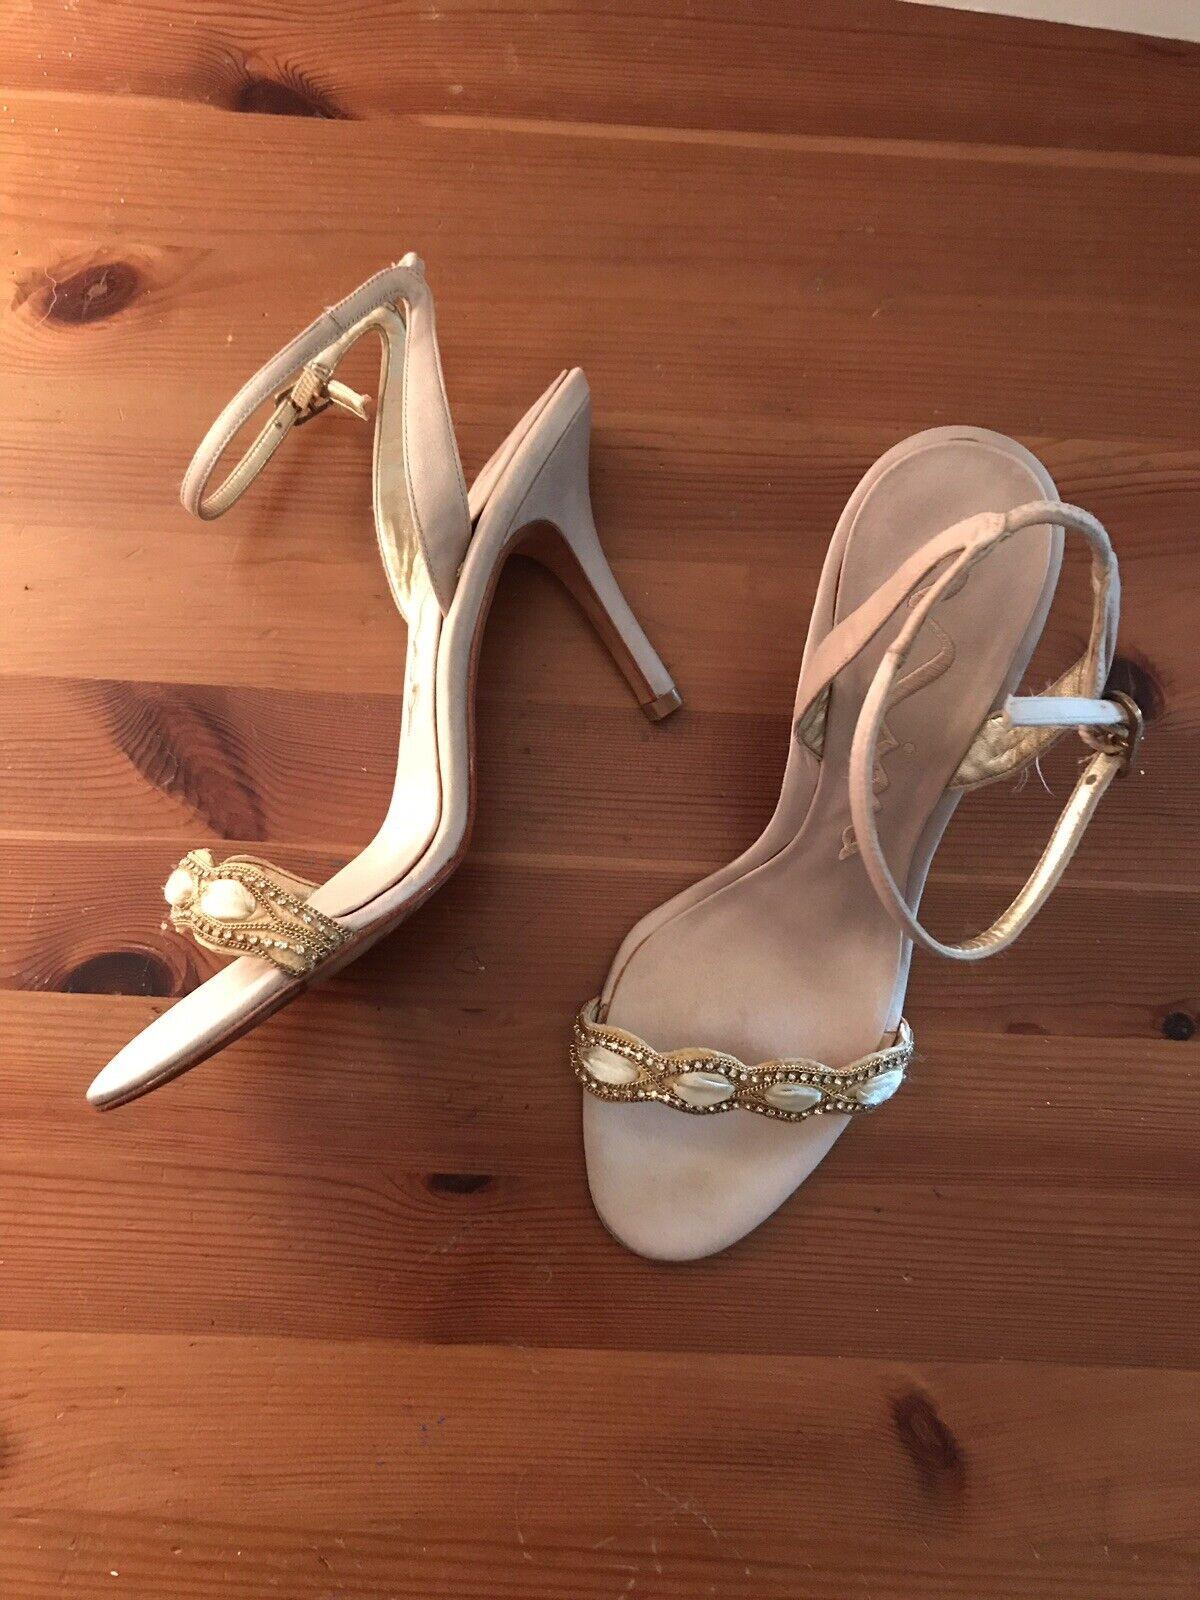 Nina Strappy Sandals Dressy Rhinestone Champagne Fabric 7 1 2 M Leather Soles